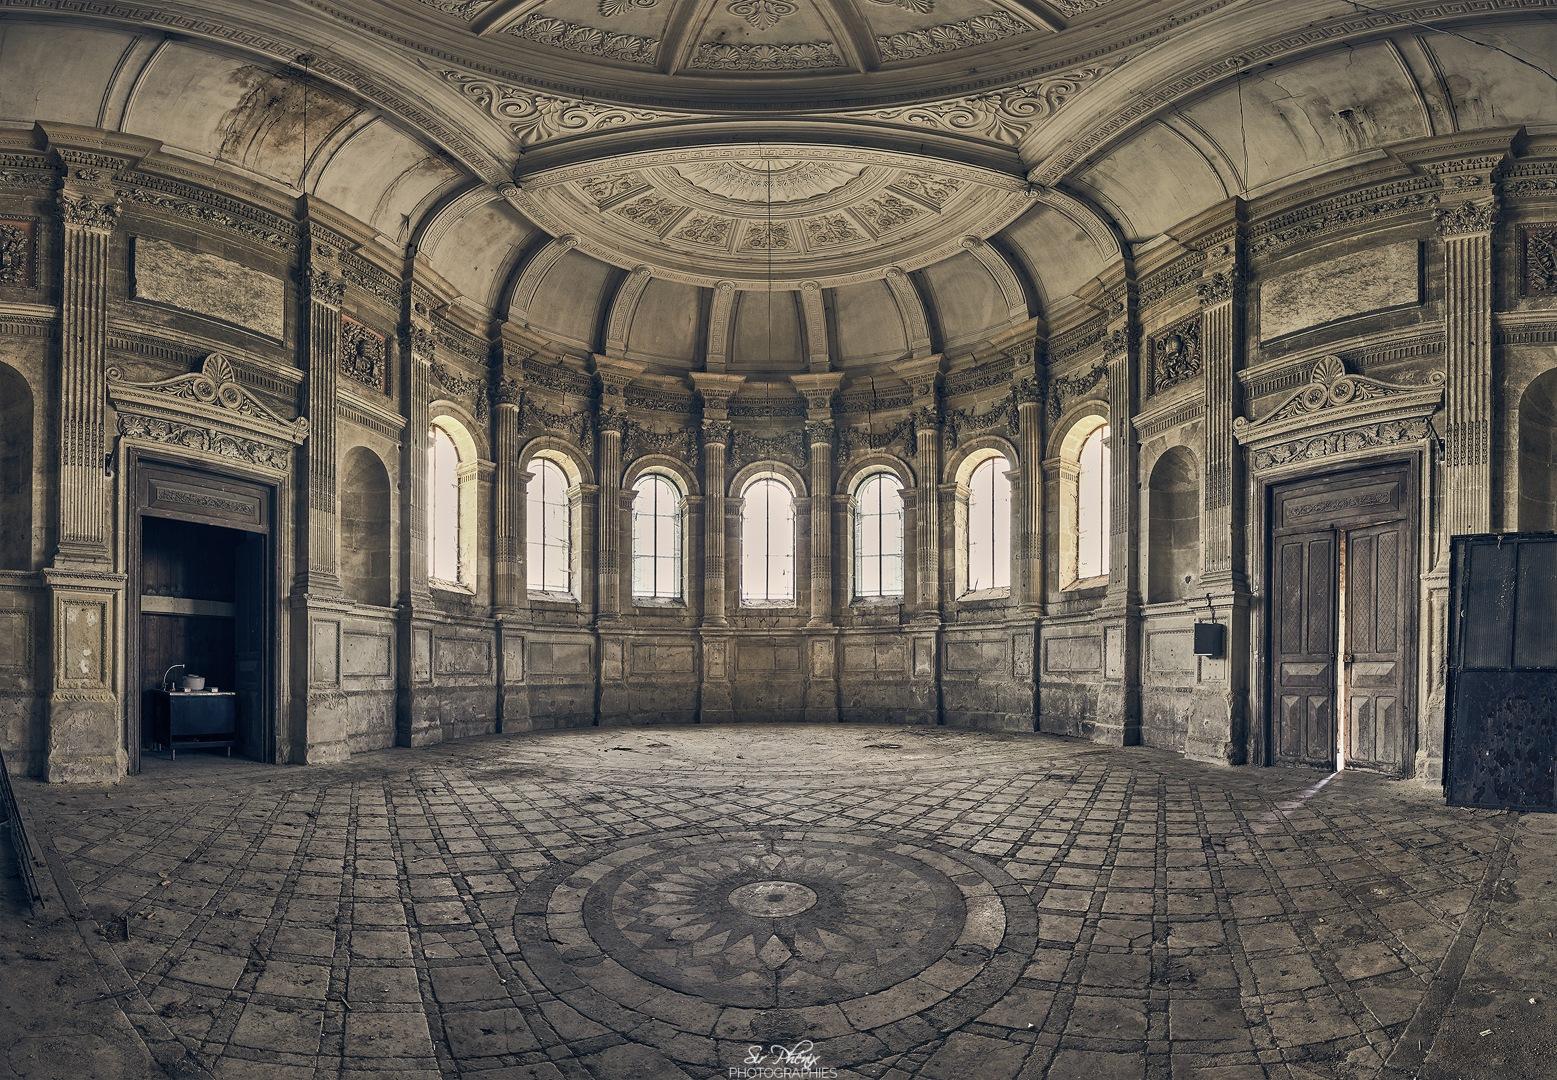 Magnificent Chapel v.2 by SirPhenix